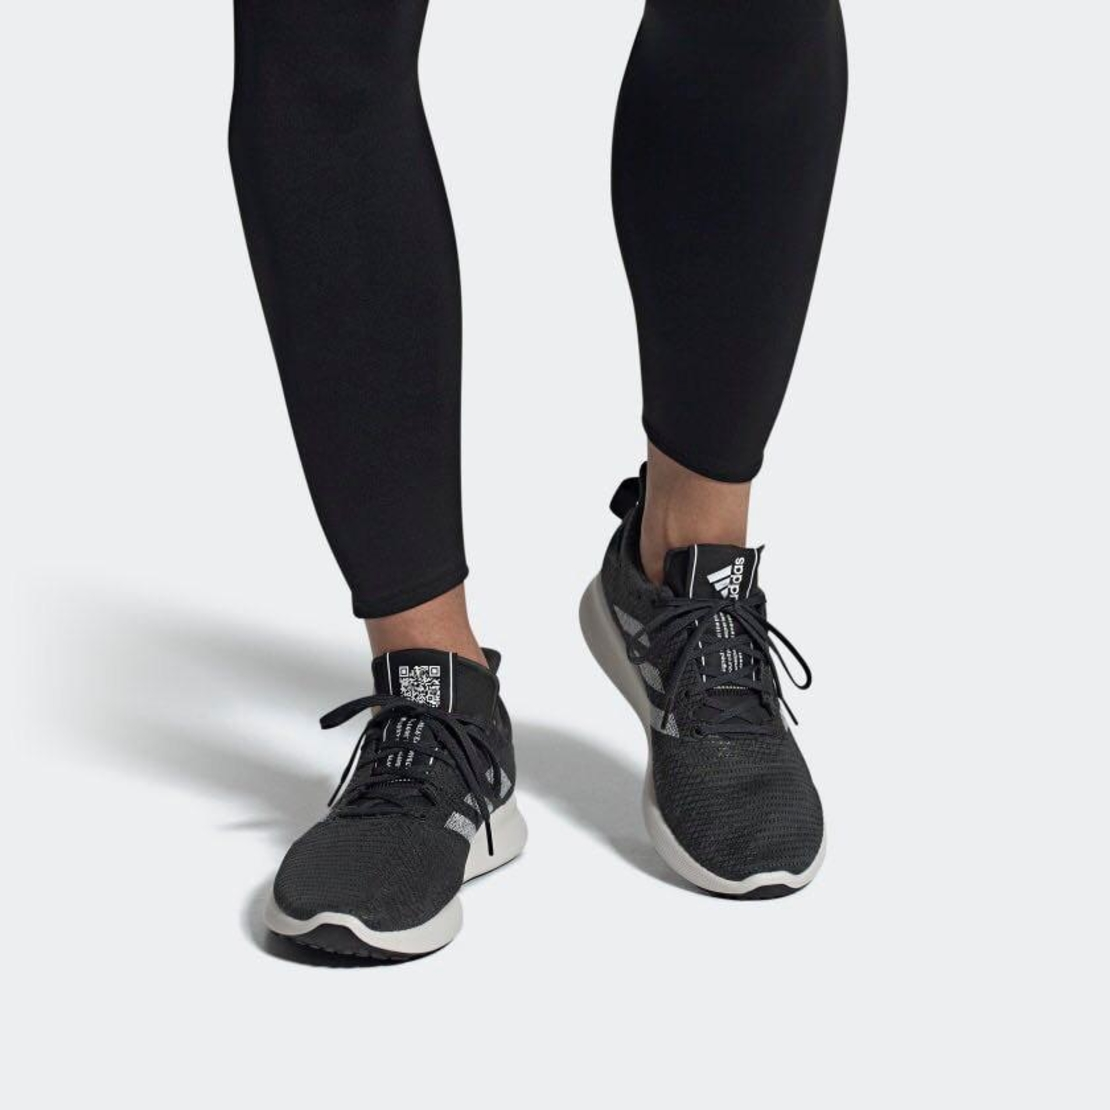 נעלי אדידס לגברים Adidas Sensebounce+ Street Shoes